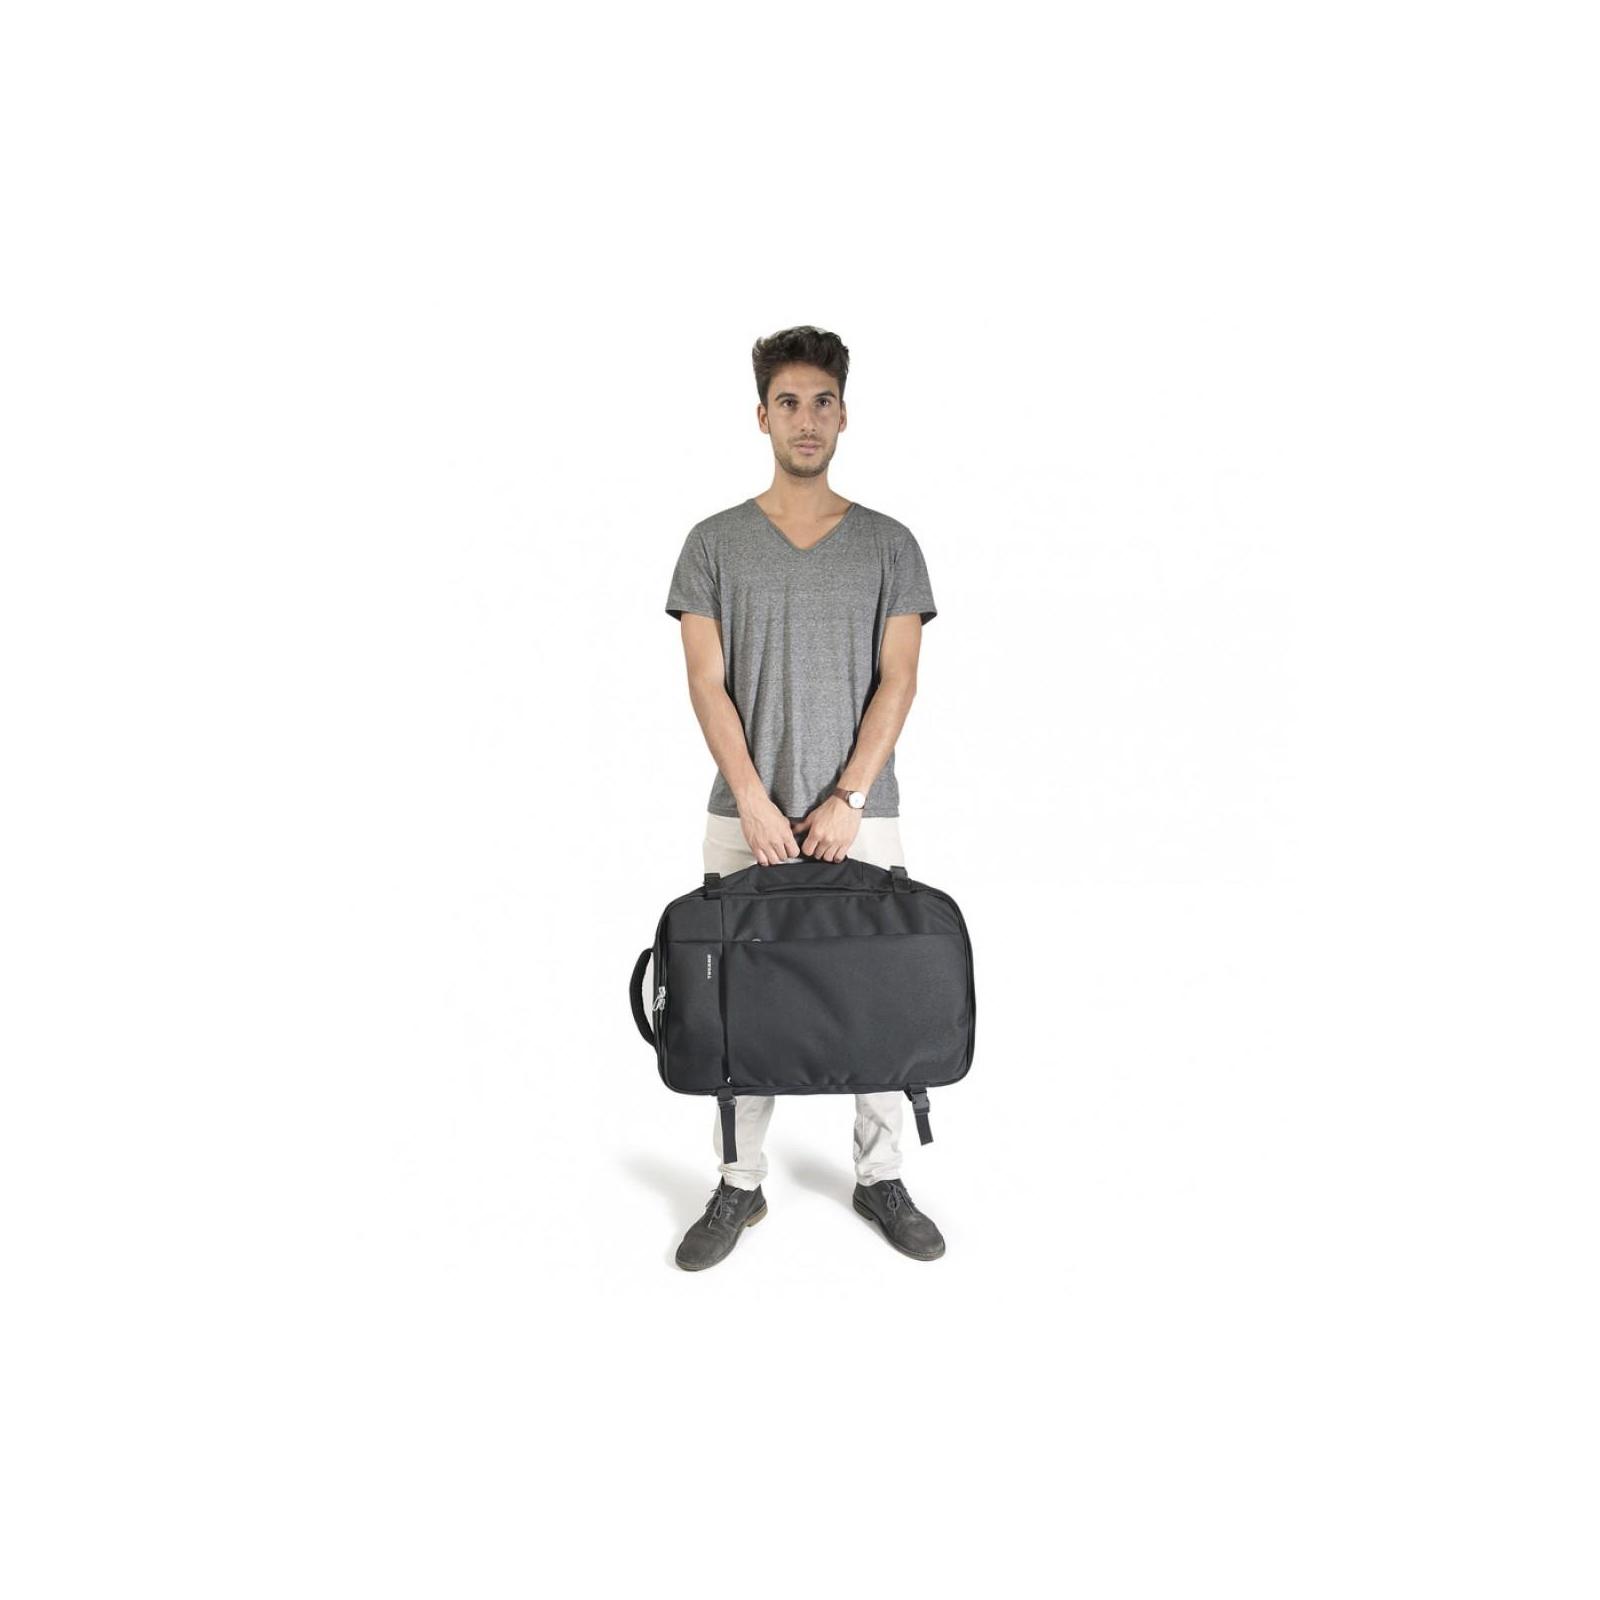 "Рюкзак для ноутбука Tucano 17.3"" TUGO' L CABIN black (BKTUG-L-BK) изображение 9"